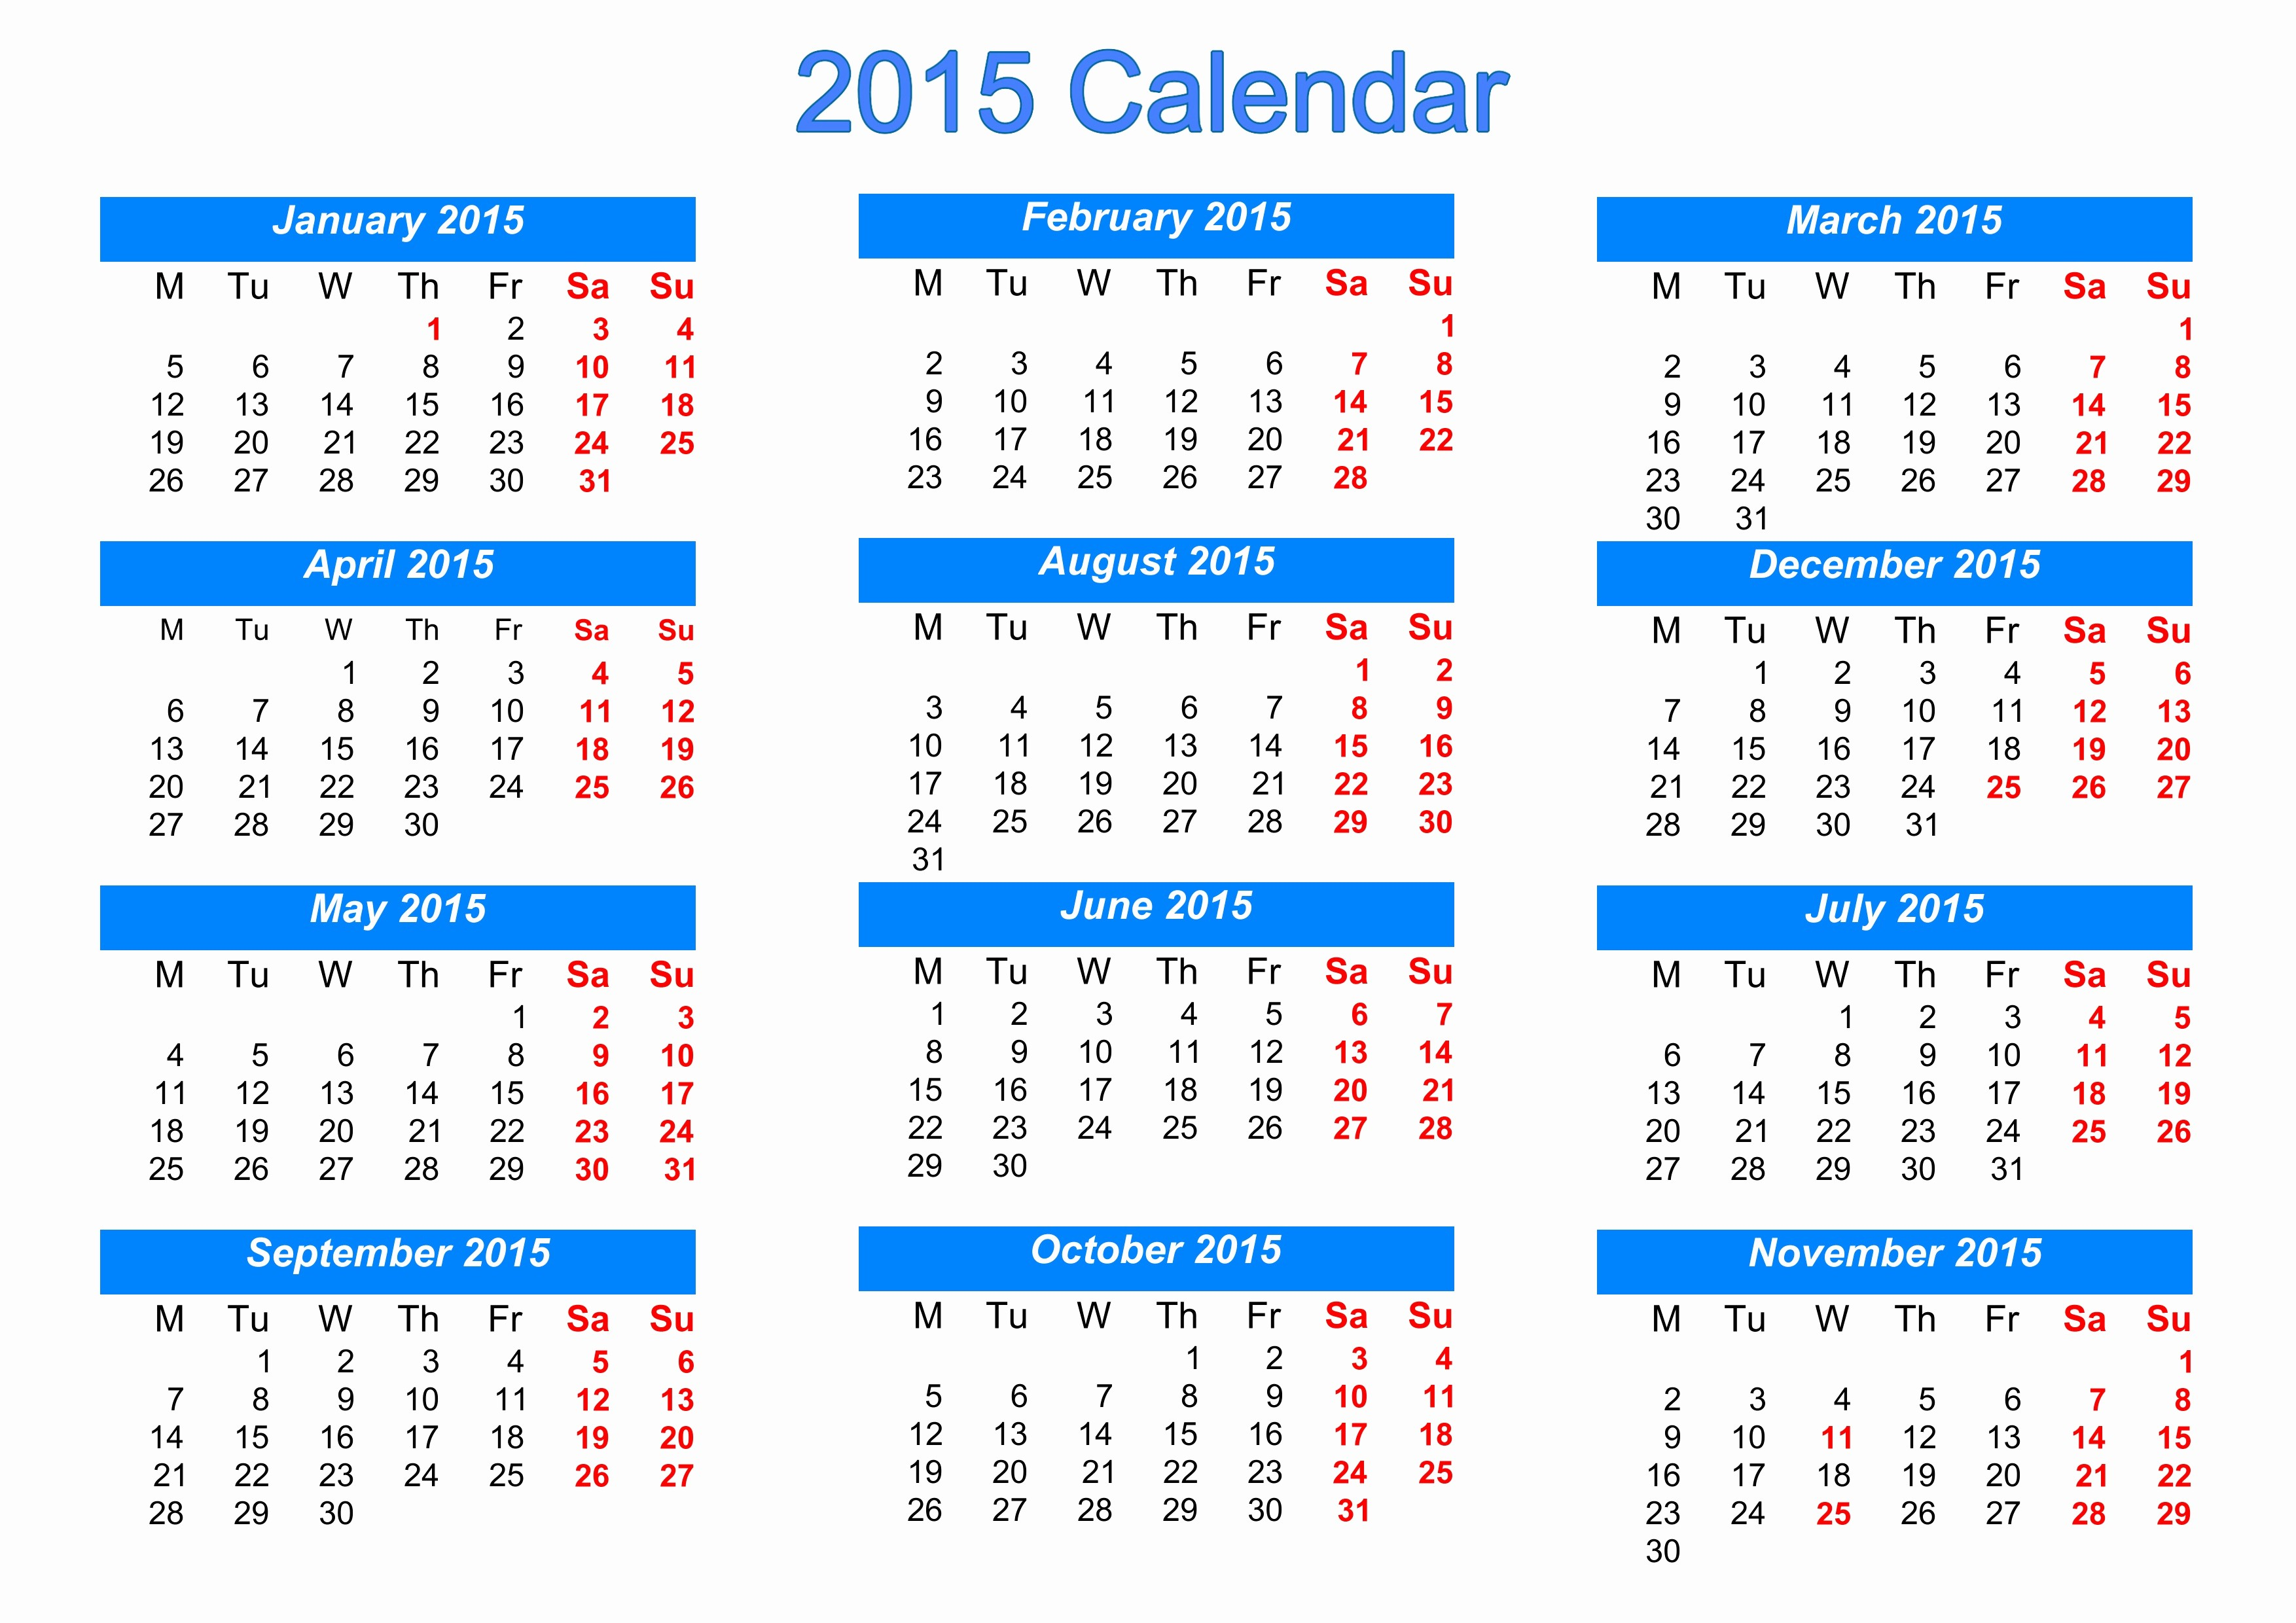 Free Calendar Templates August 2015 Unique Calendar 2015 Template Free – 2017 Printable Calendar